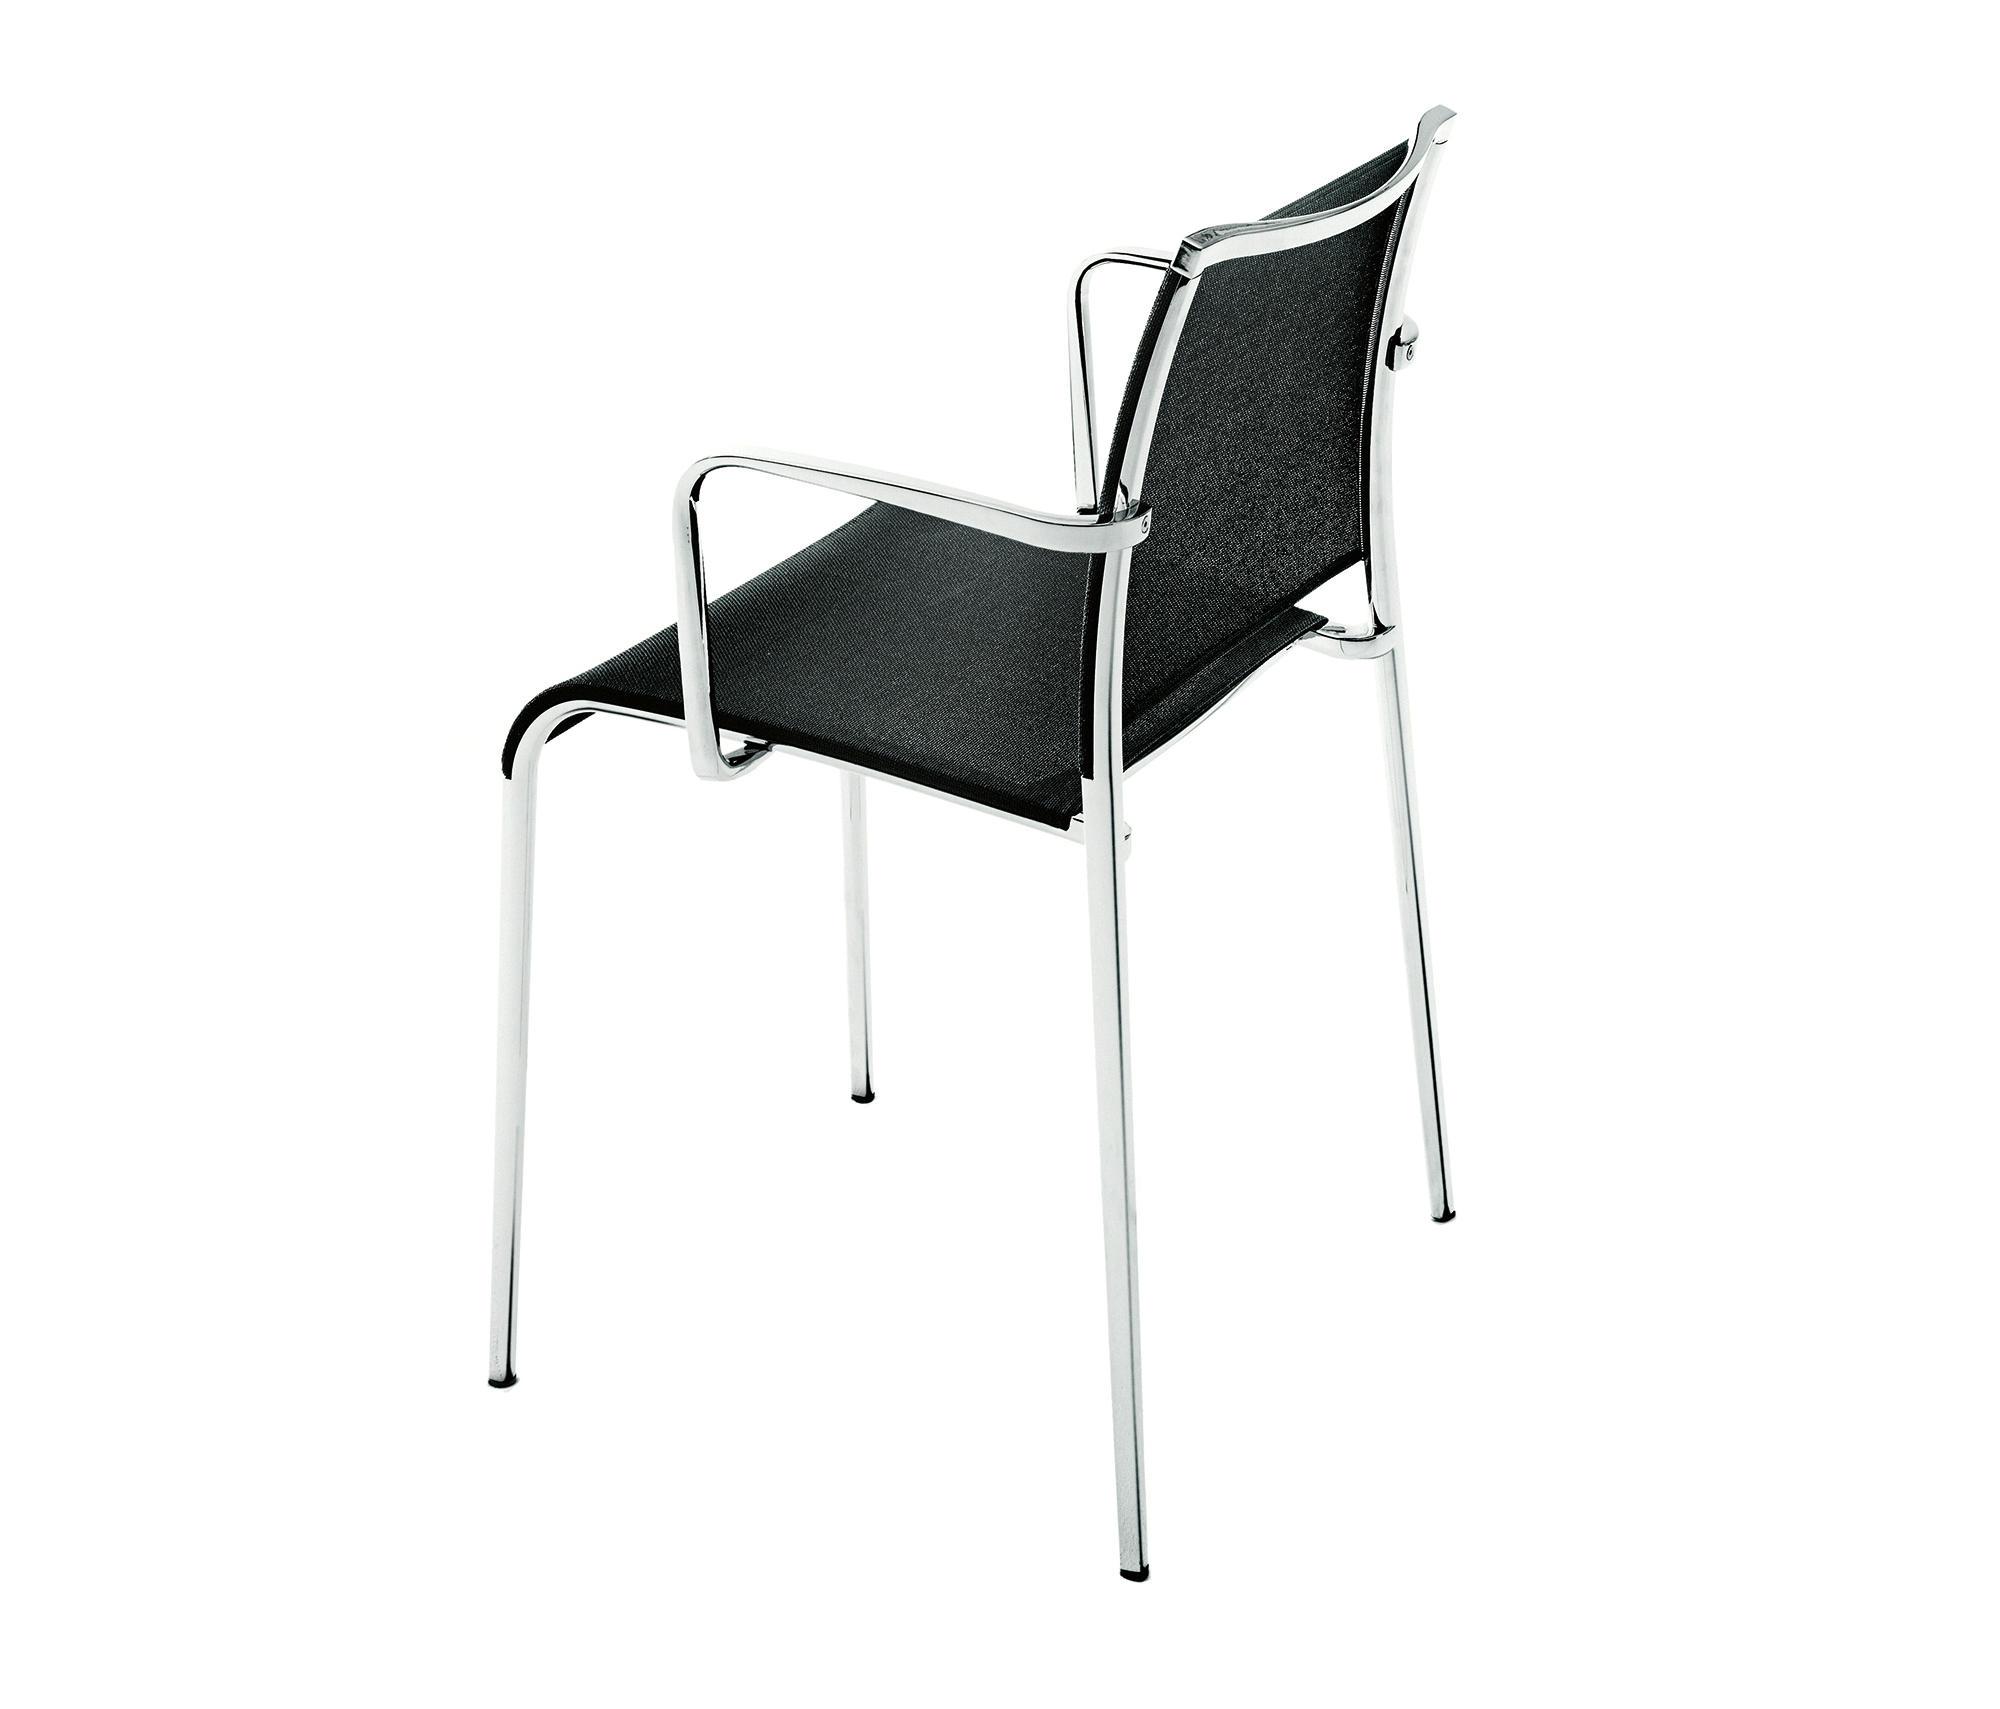 sand light stuhl mit armlehnen st hle von desalto architonic. Black Bedroom Furniture Sets. Home Design Ideas